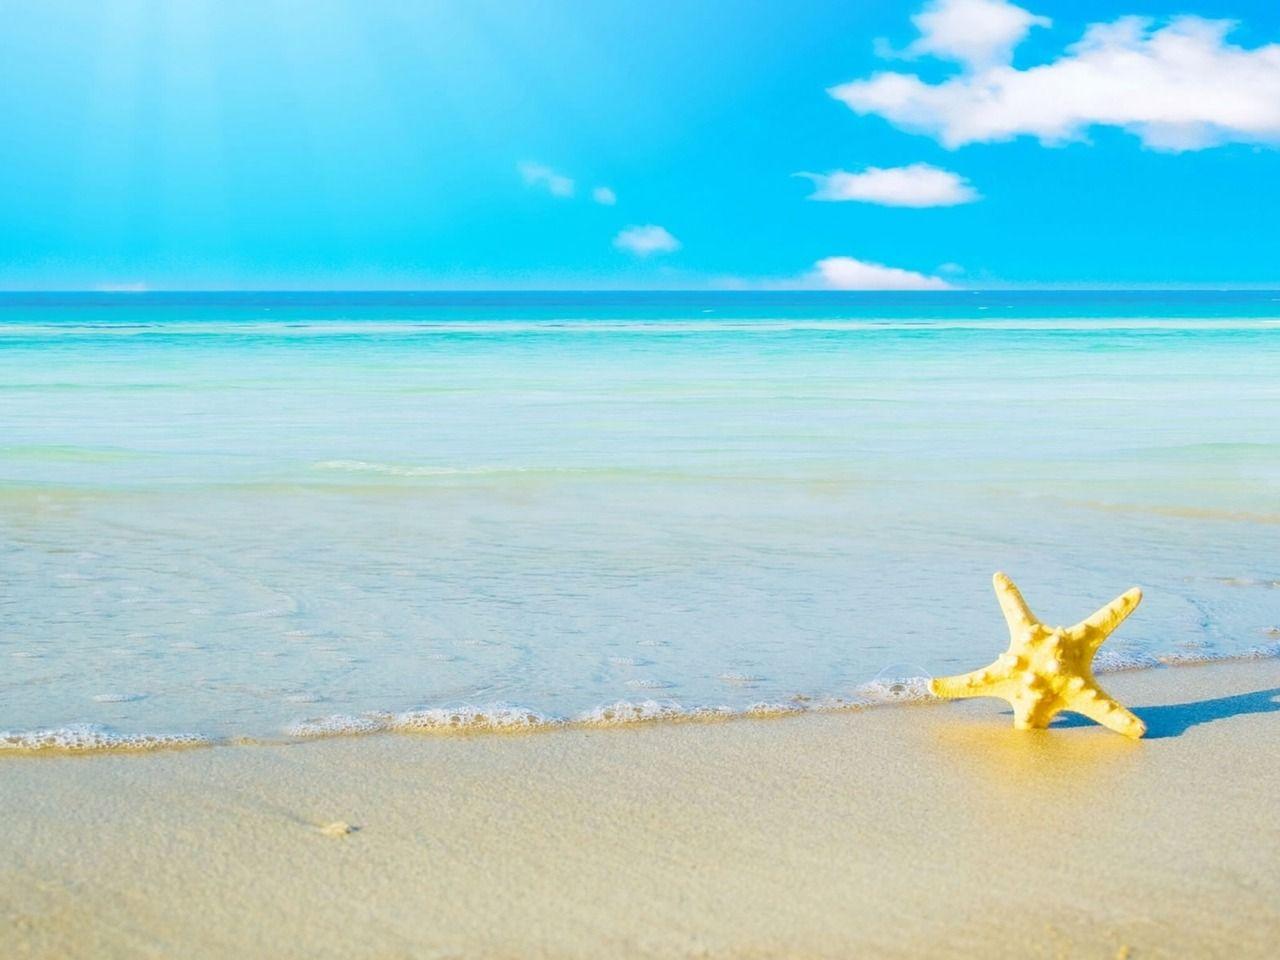 Star Yellow Sea Hd Desktop Backgrounds Wallpapers #12049020976